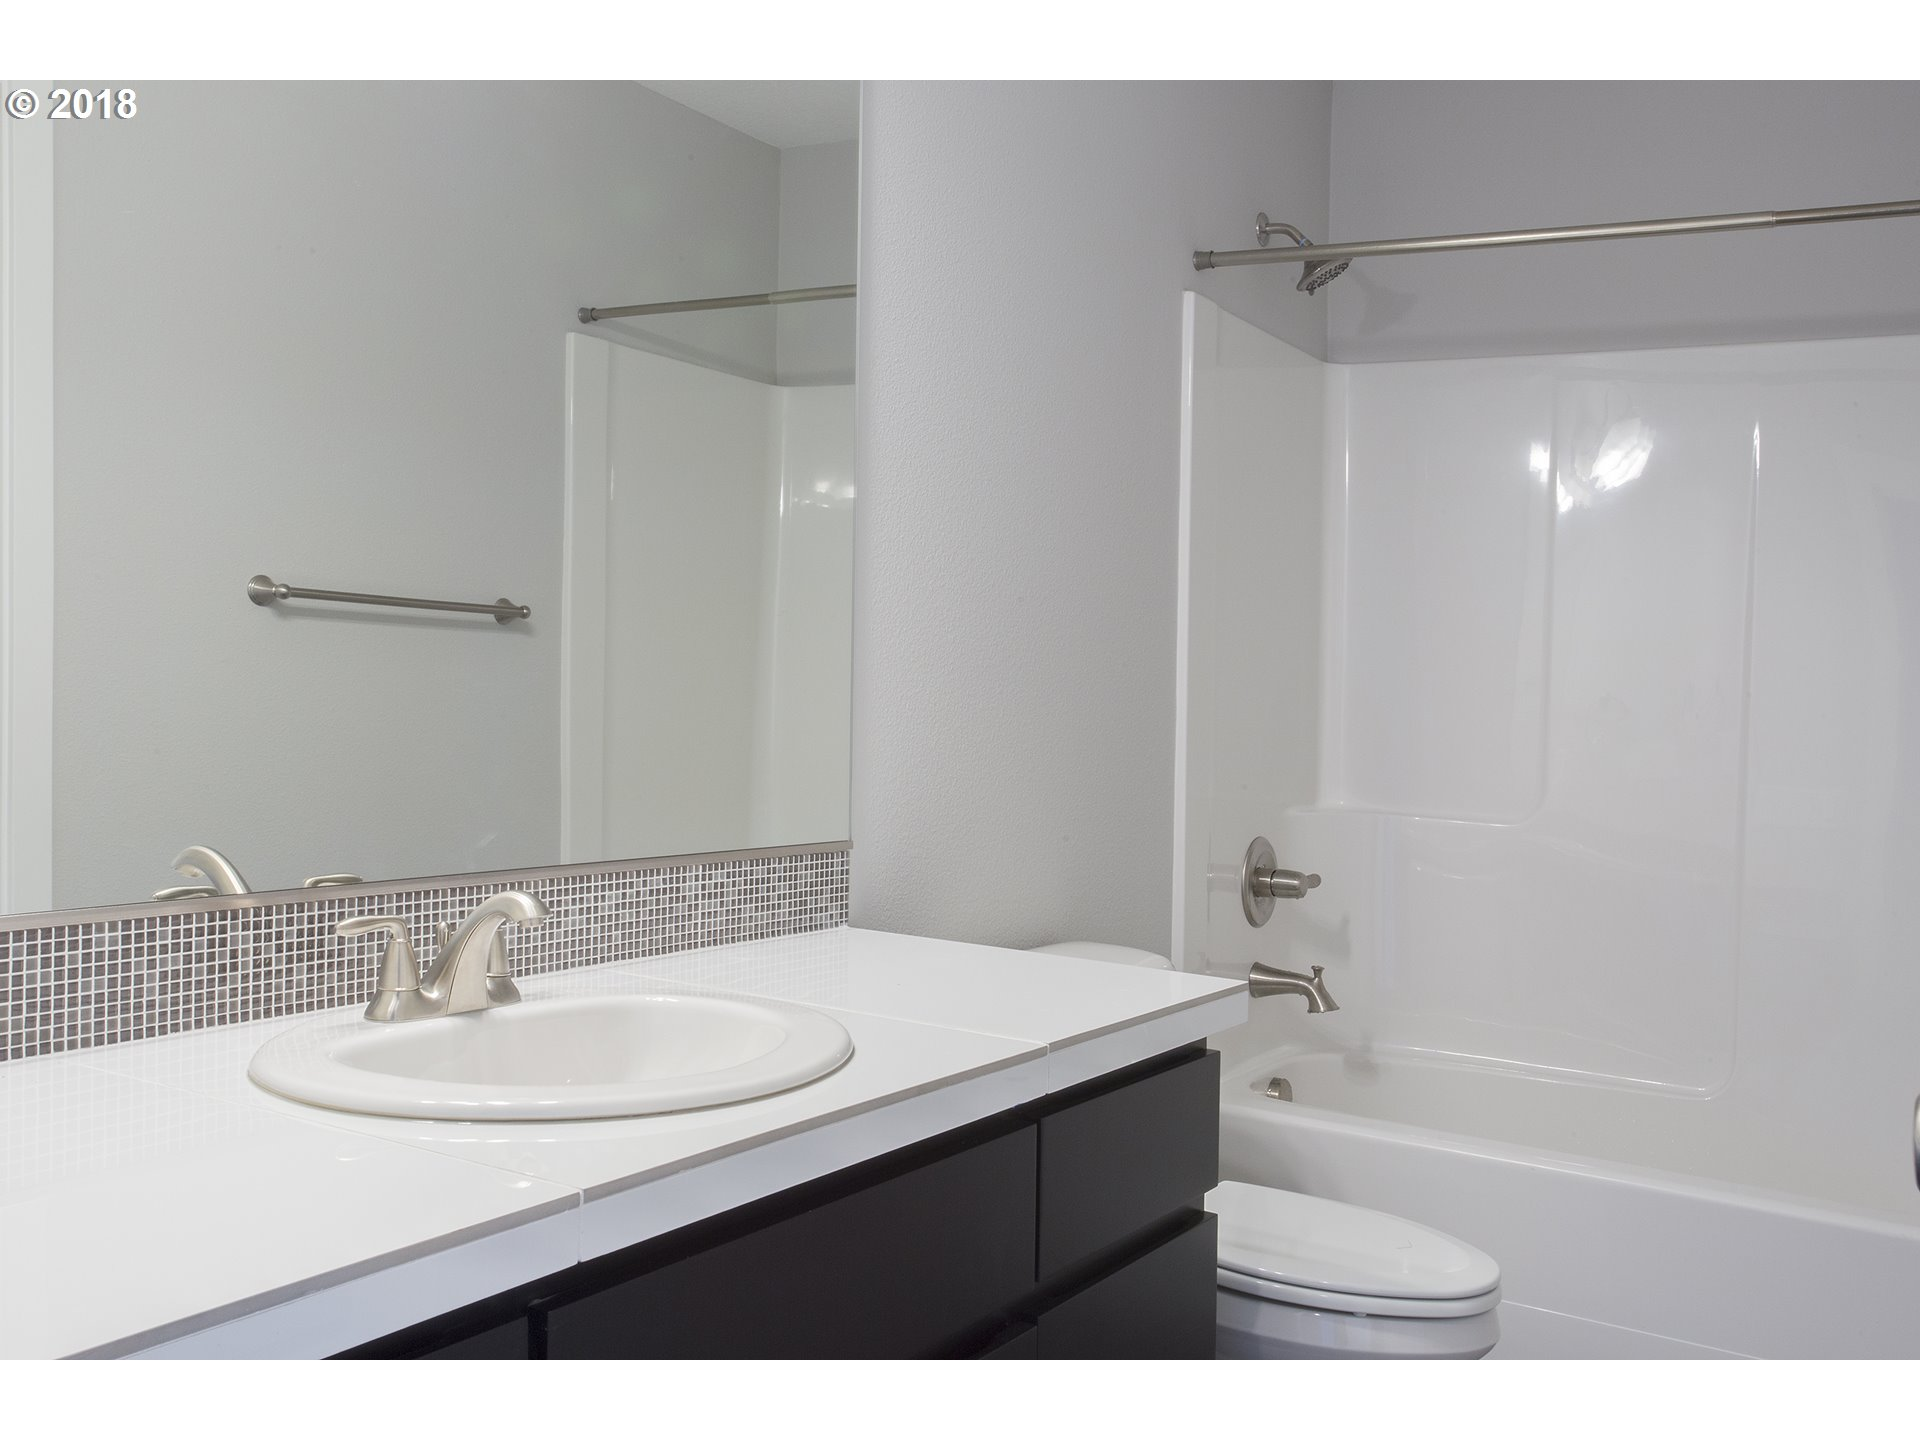 5988 SE 33rd ST Gresham, OR 97080 - MLS #: 18427782